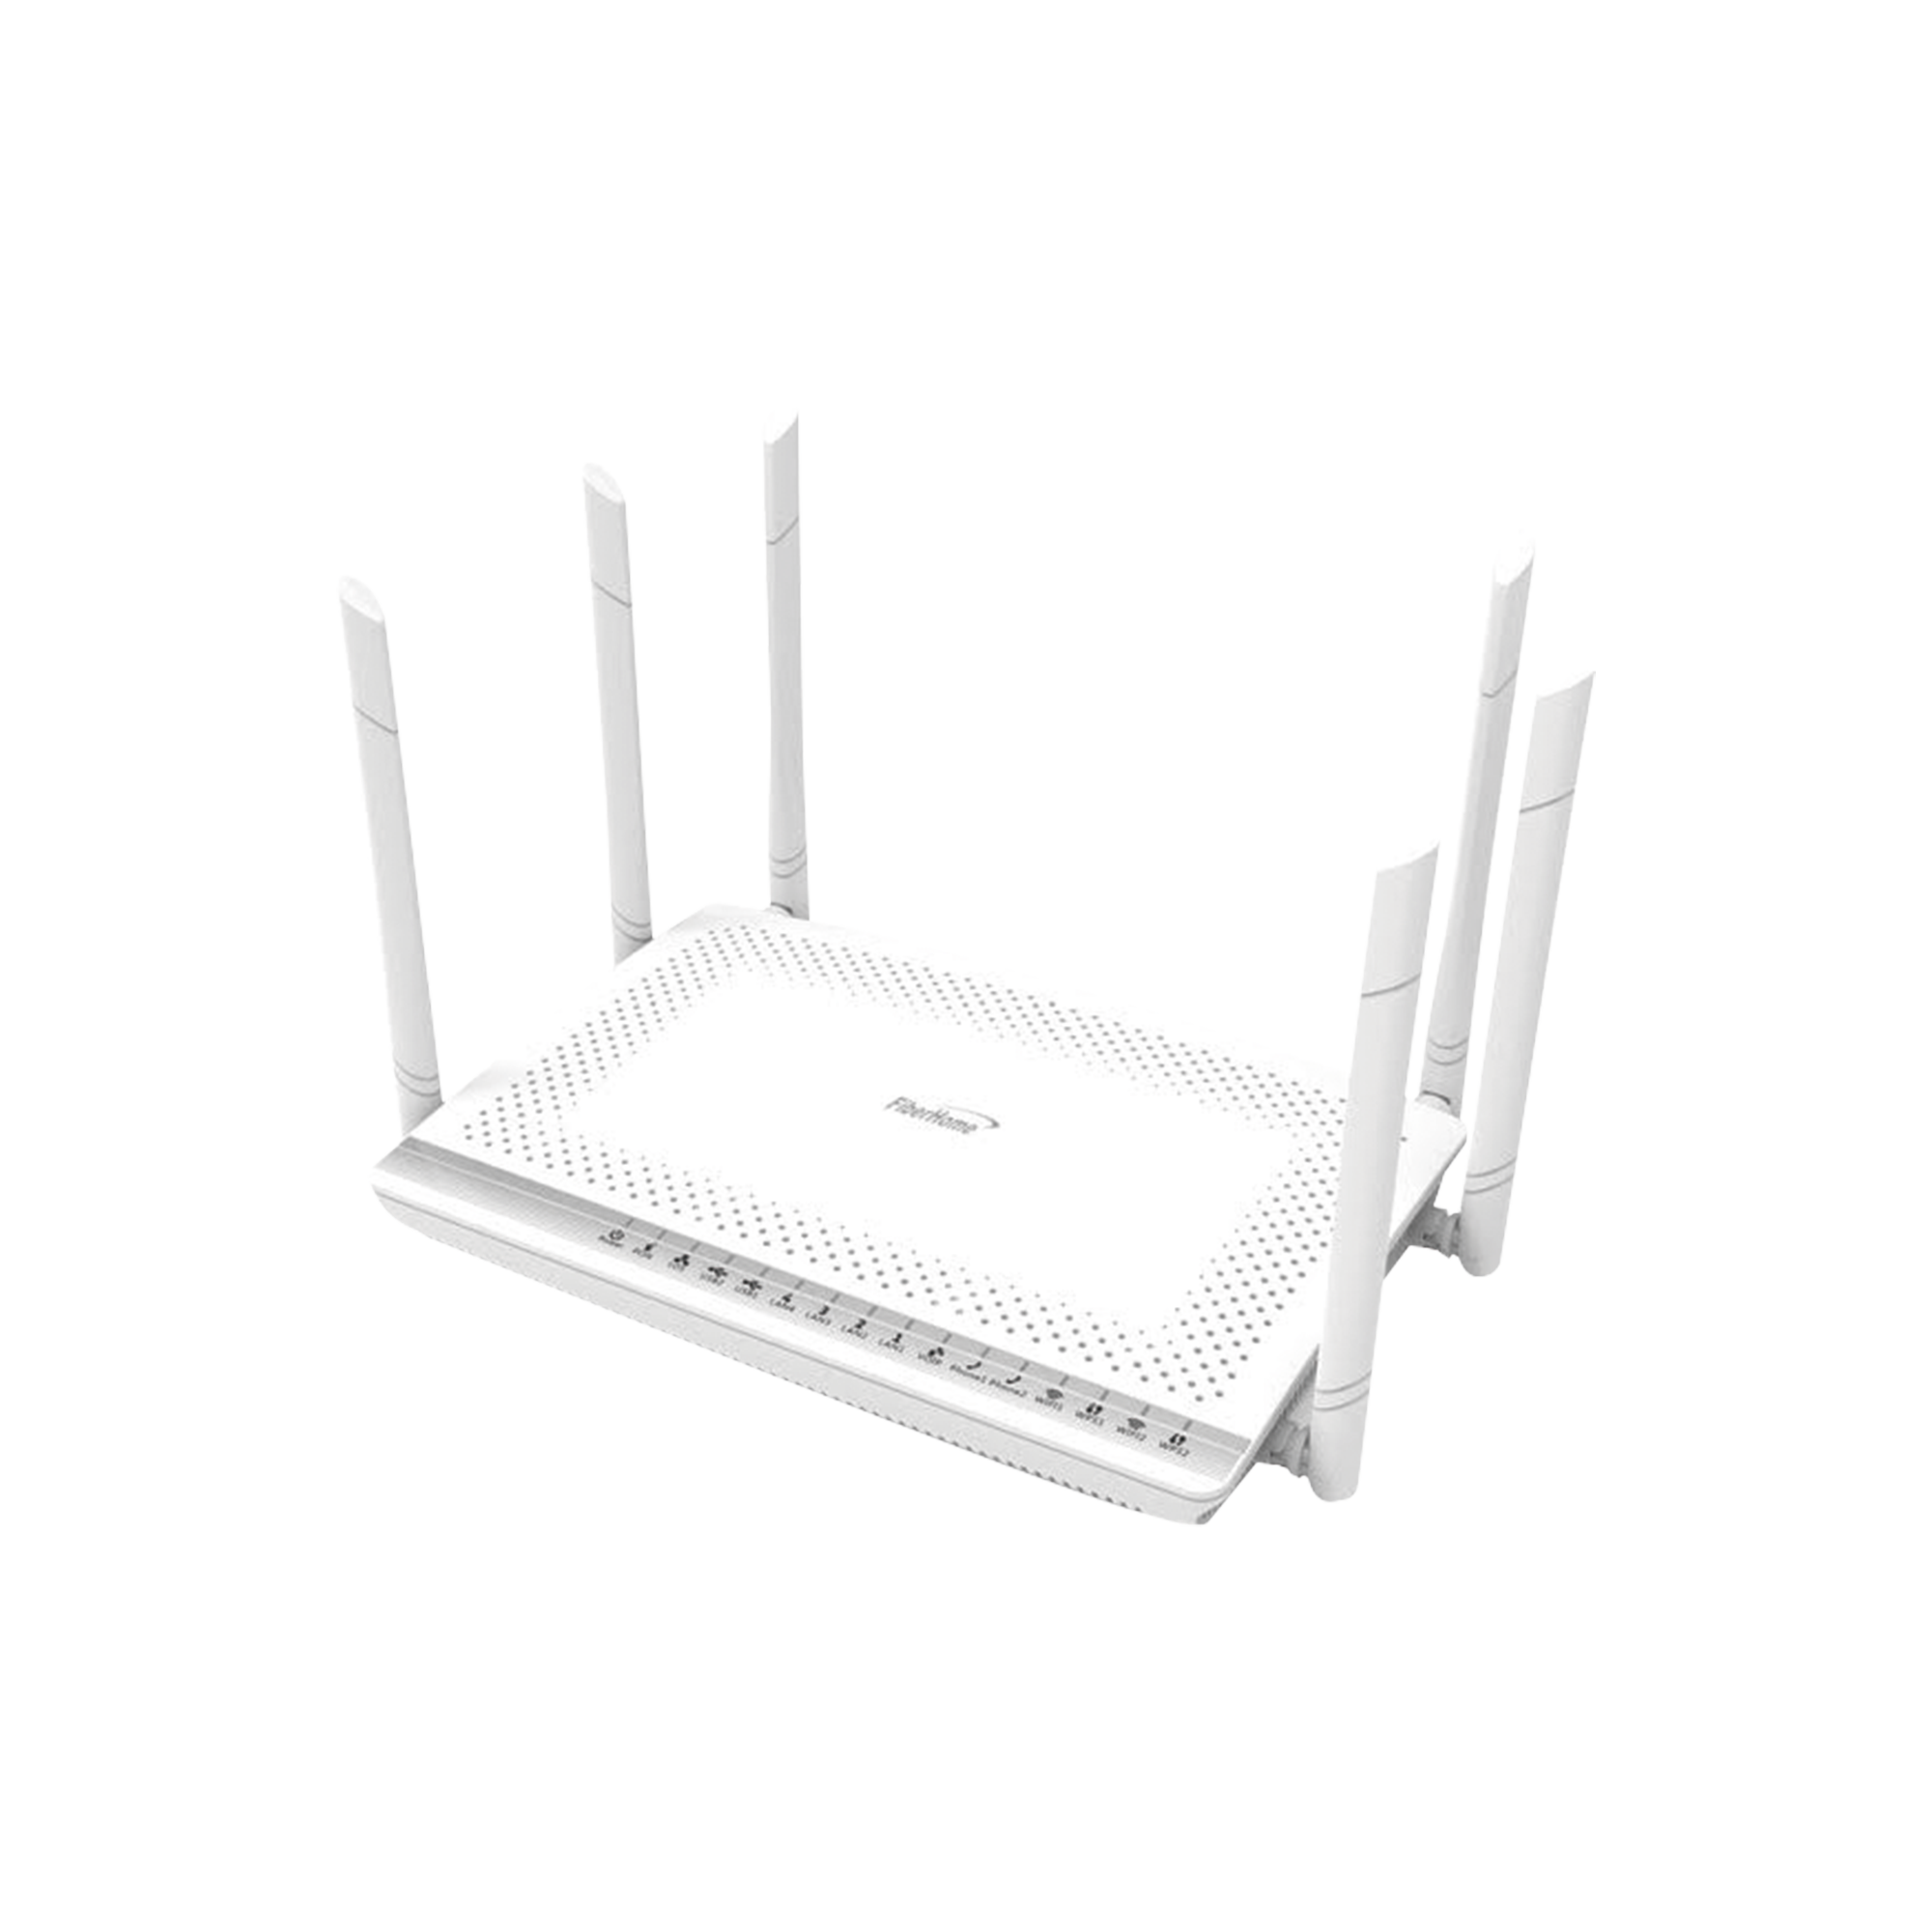 ONT Para Aplicaciones FTTH/GPON, con Wifi Doble Banda 2.4/5GHz, Mimo 3X3, 4 Puertos Gigabit Ethernet y 2 Puertos USB 2.0, Acepta Conector de Fibra Óptica SC/APC o SC/UPC